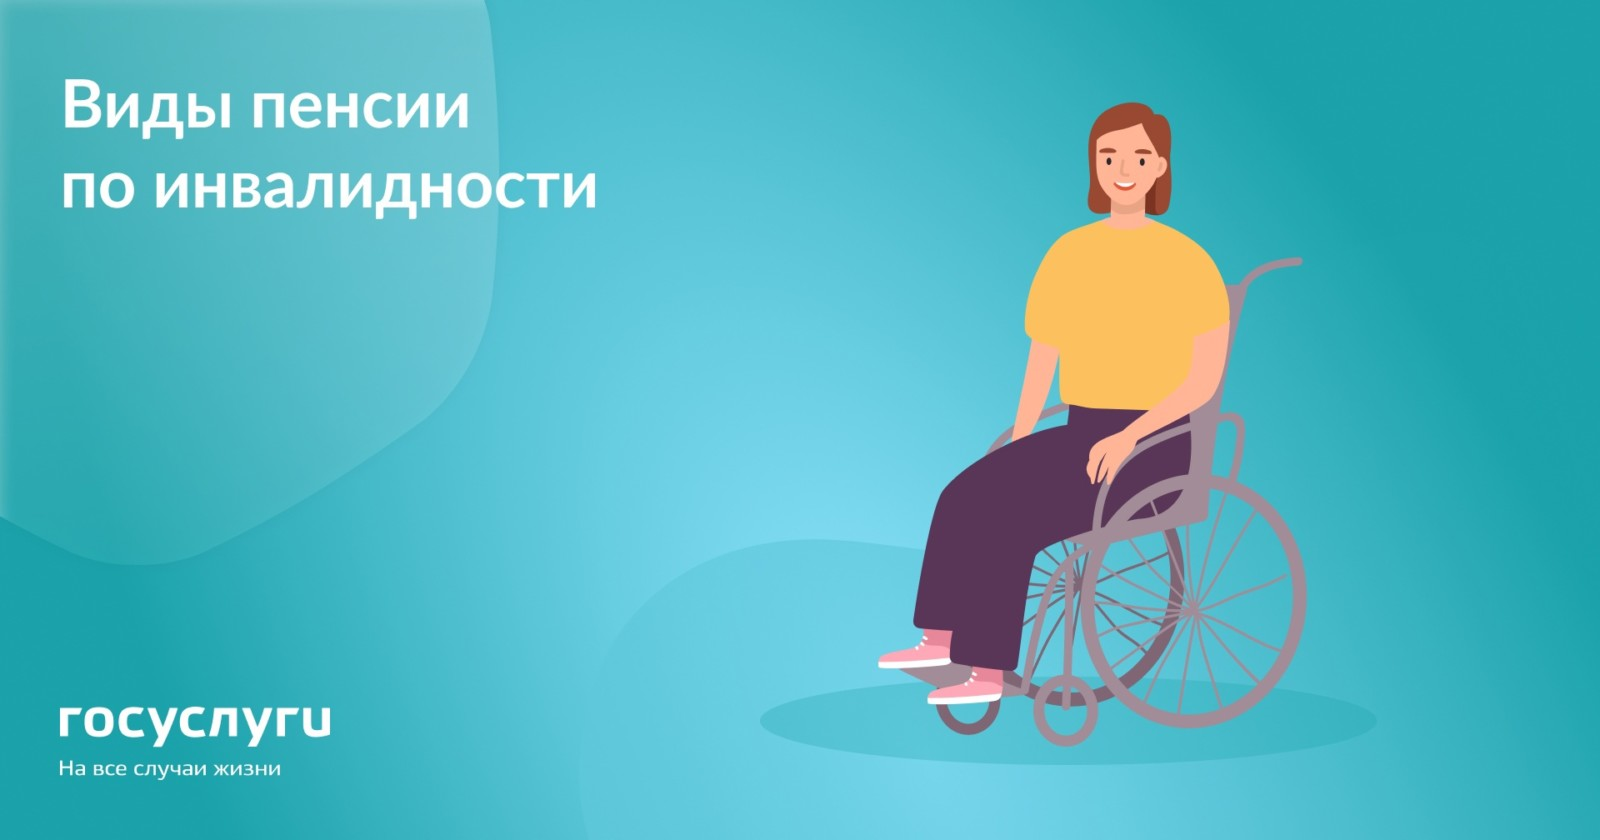 Виды пенсии по инвалидности